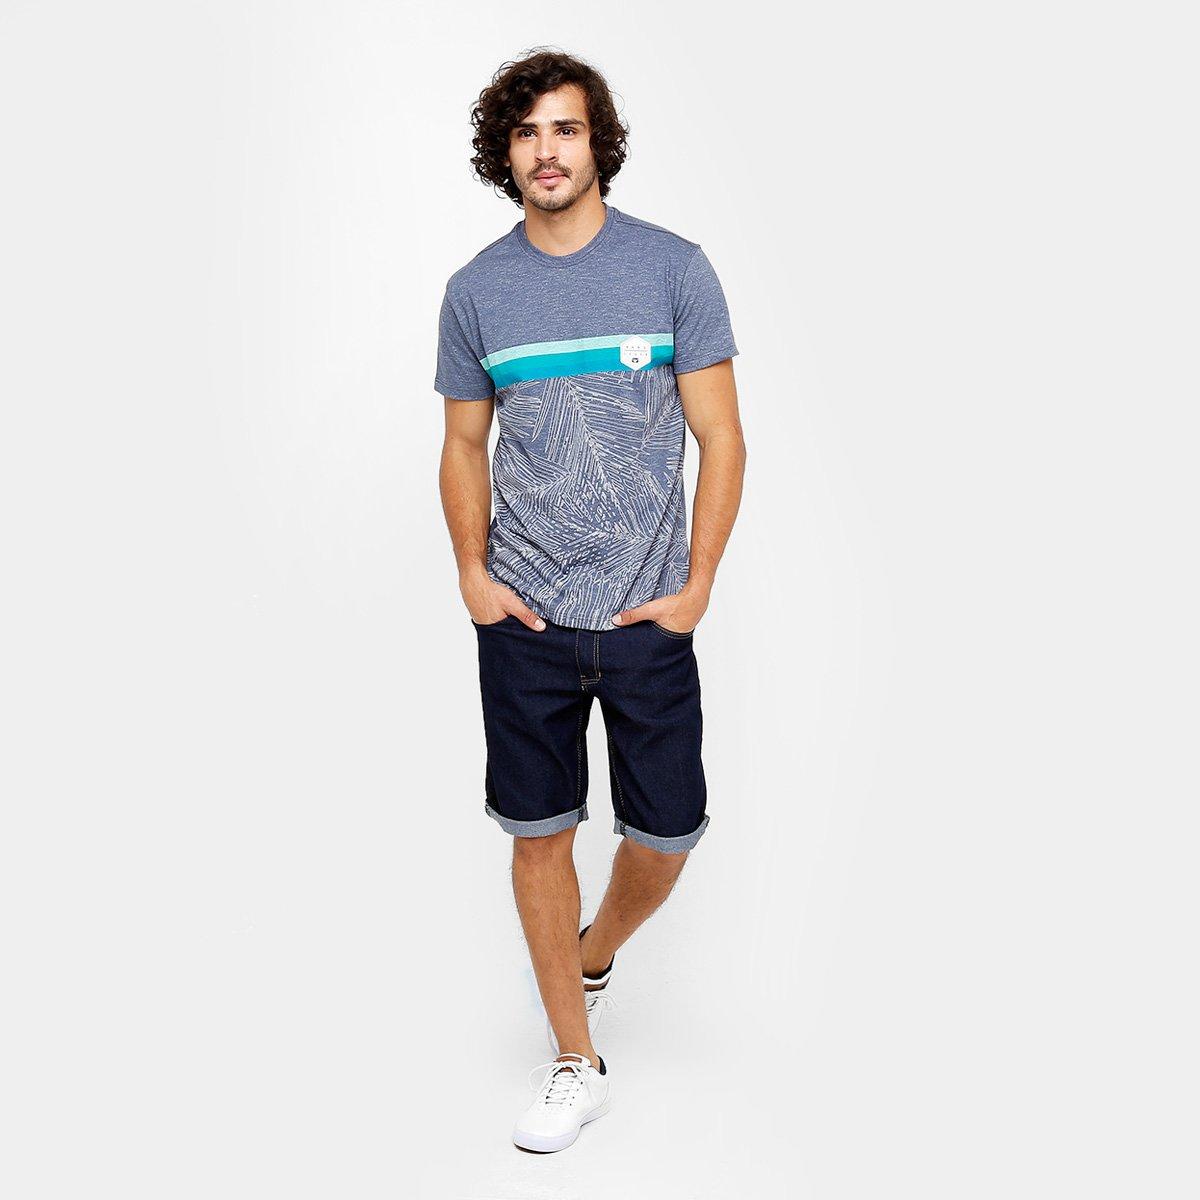 Camiseta Hang Loose Esp Palms Masculina - Cinza - Compre Agora  8c56852cdf7ec